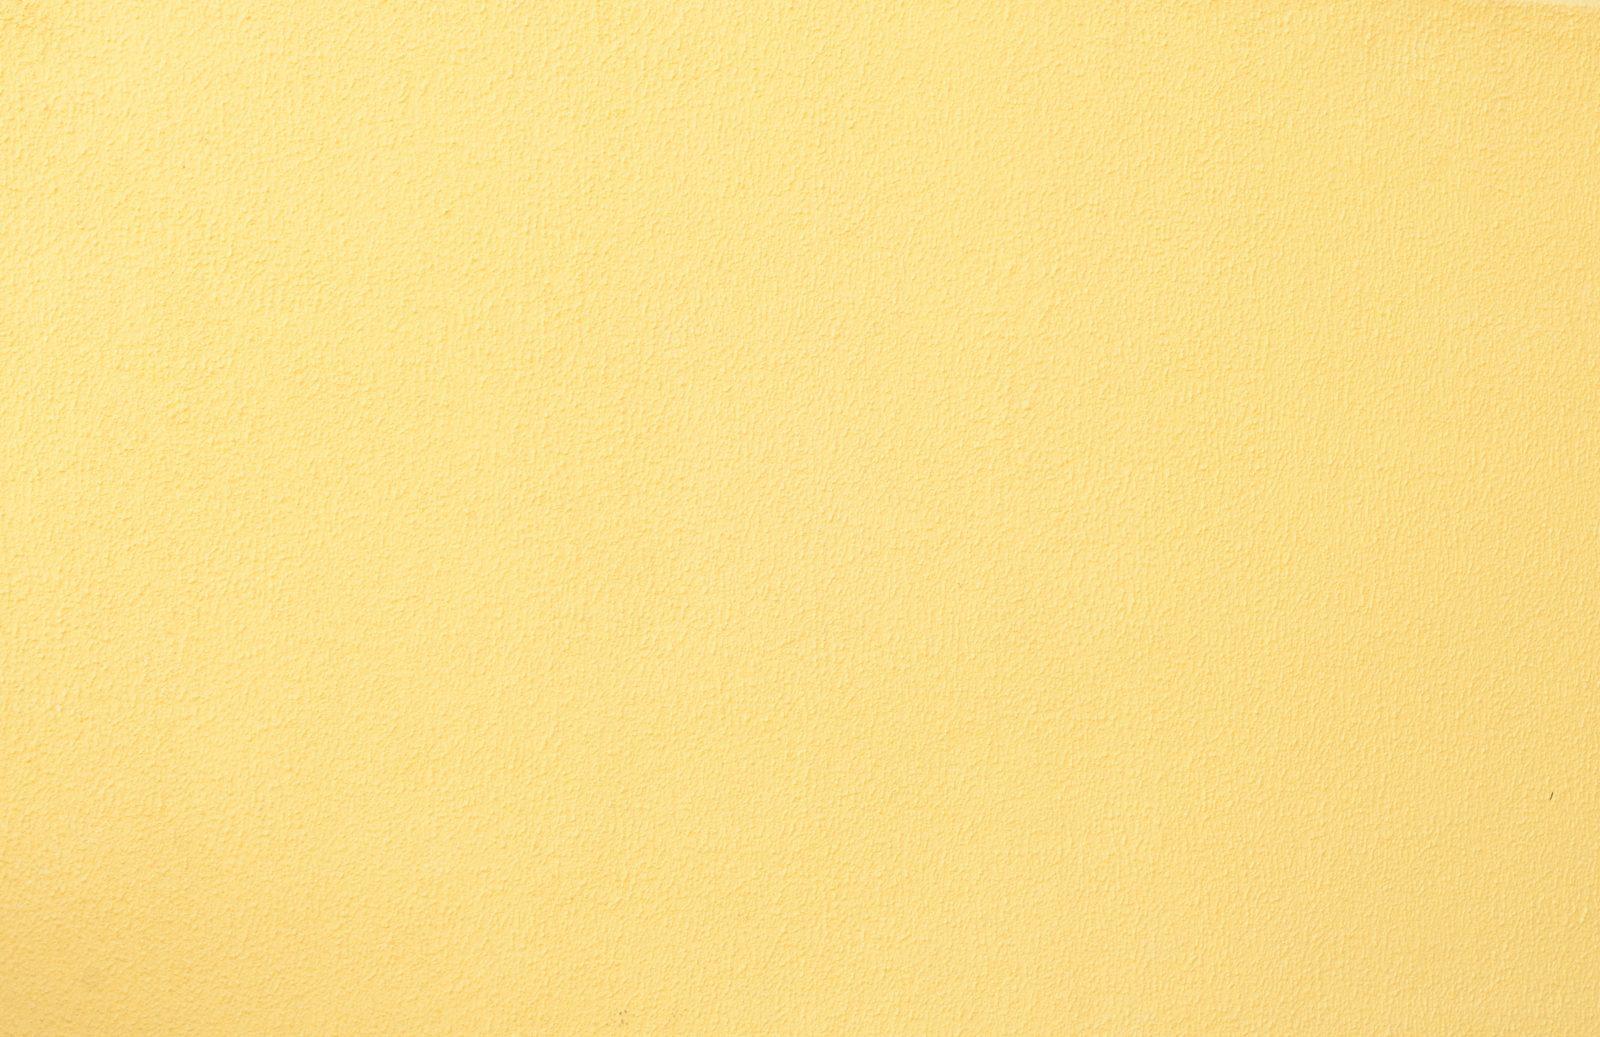 Subtle plaster concrete yellow wall